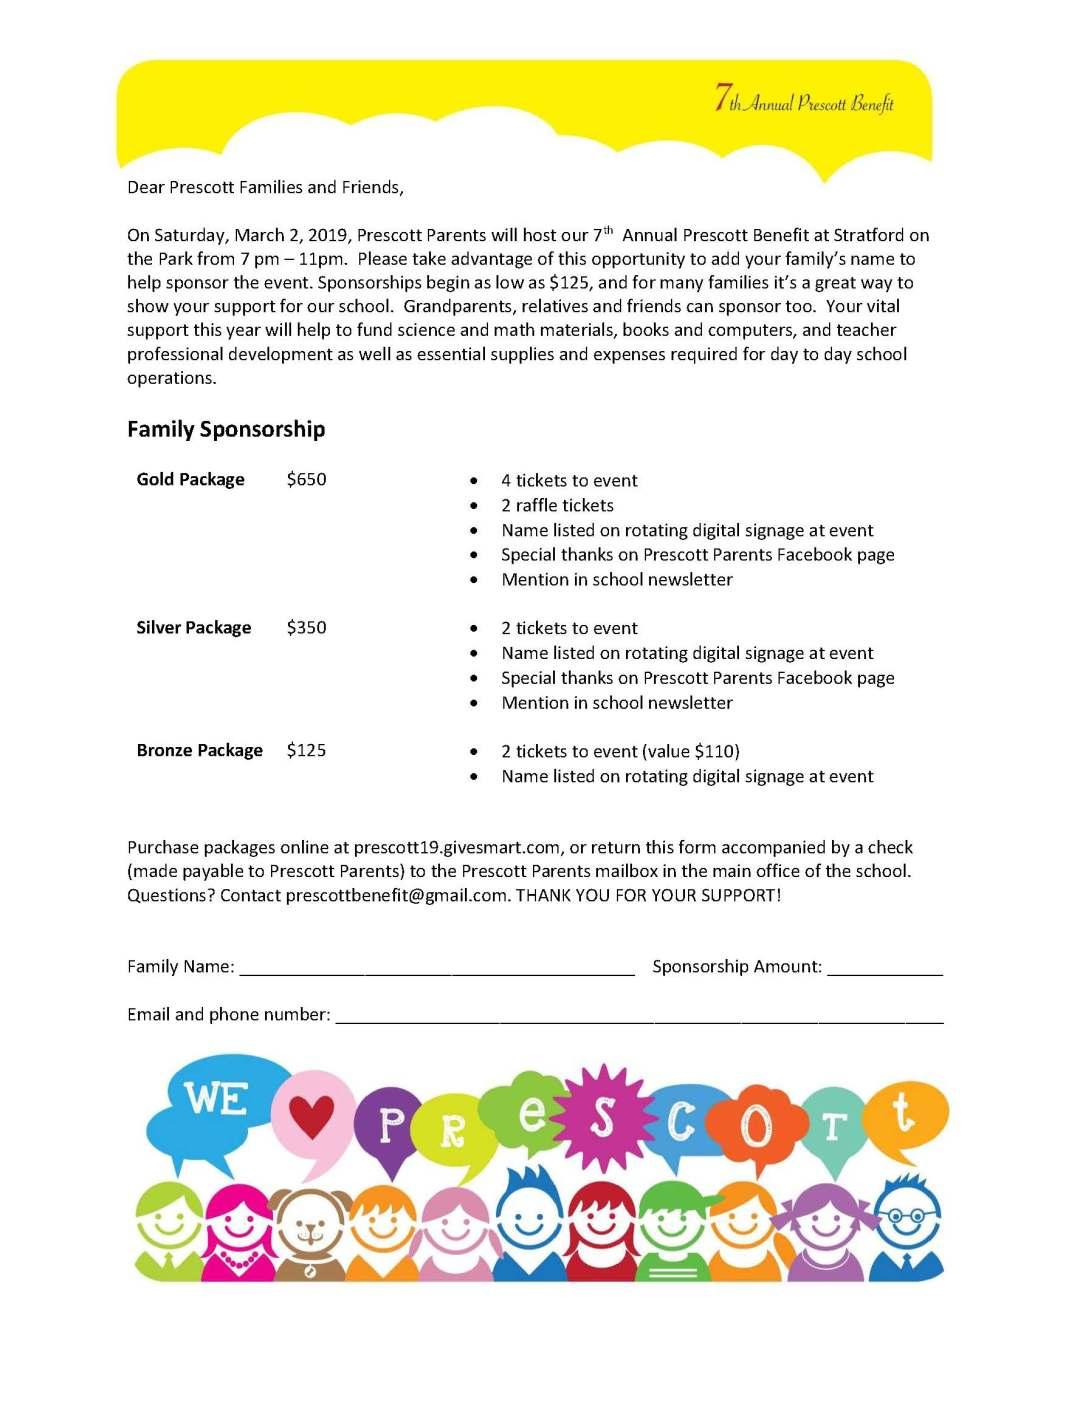 Prescott Benefit Family Sponsorship Form 2019_Page_1